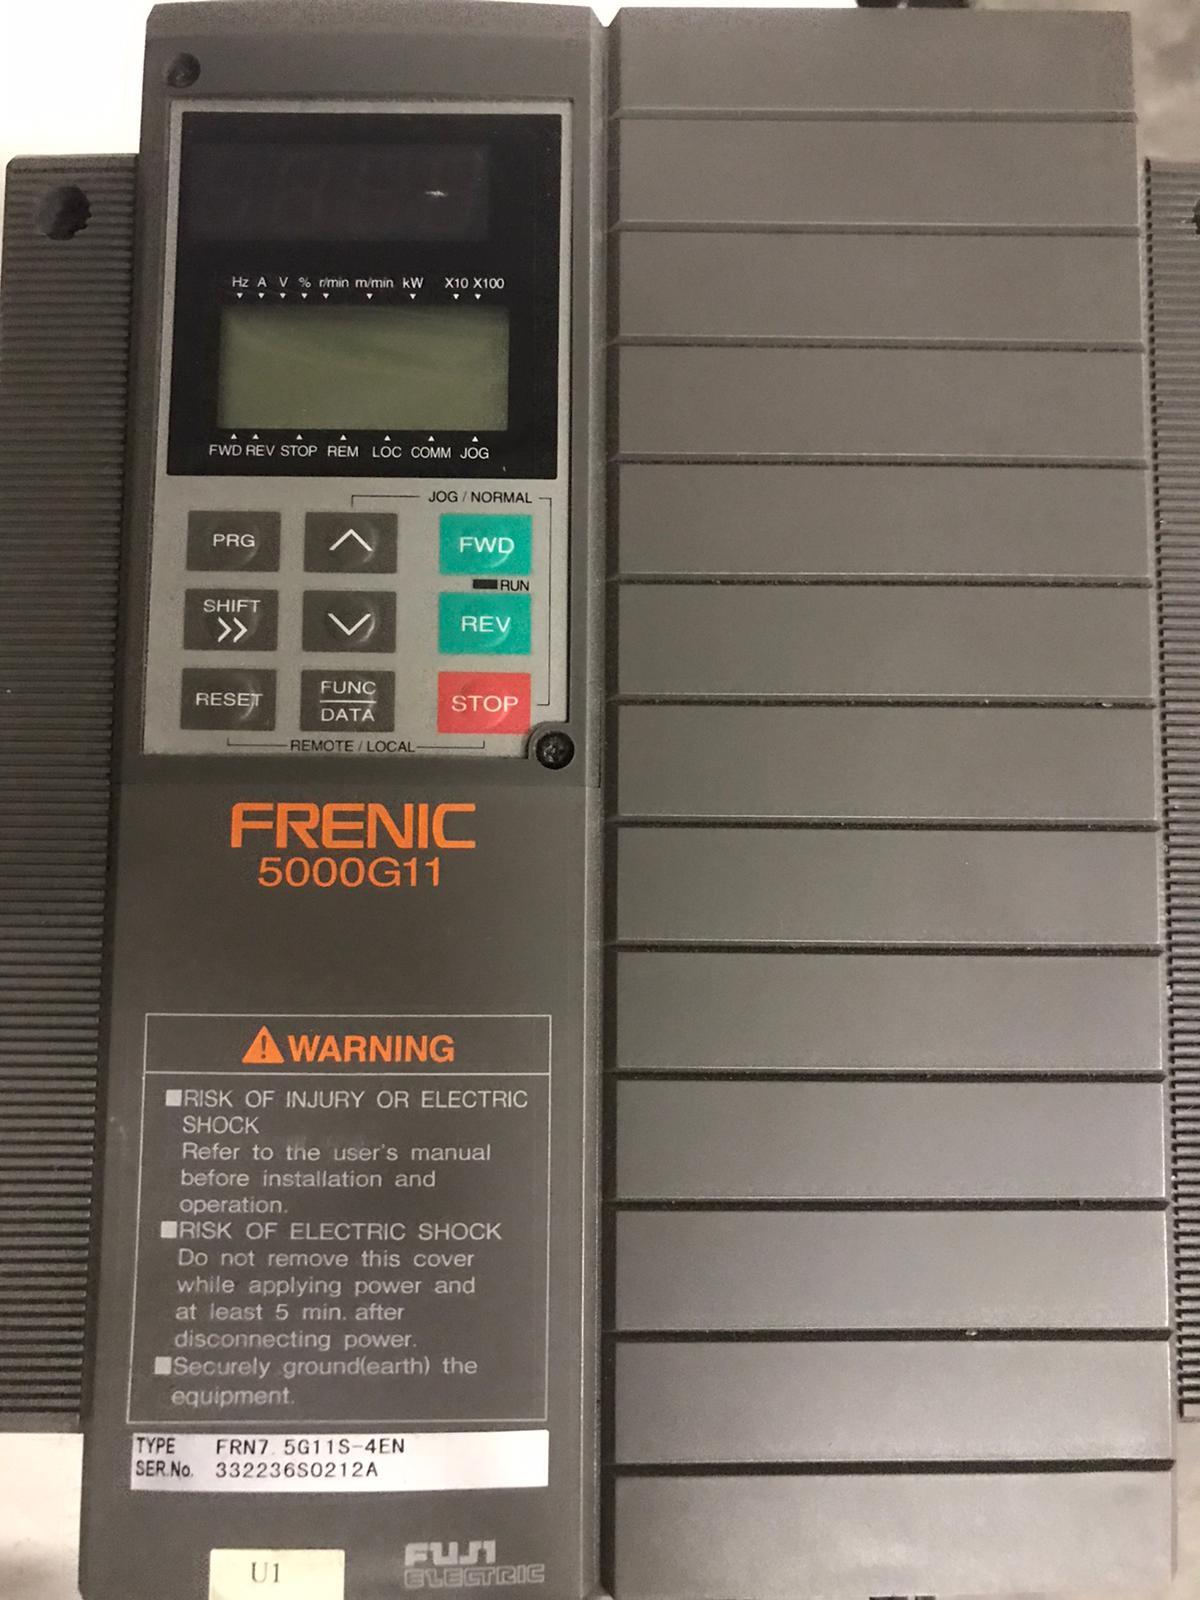 Inverter Frenic 11 kw FVR E11 VENDO in vendita - foto 2